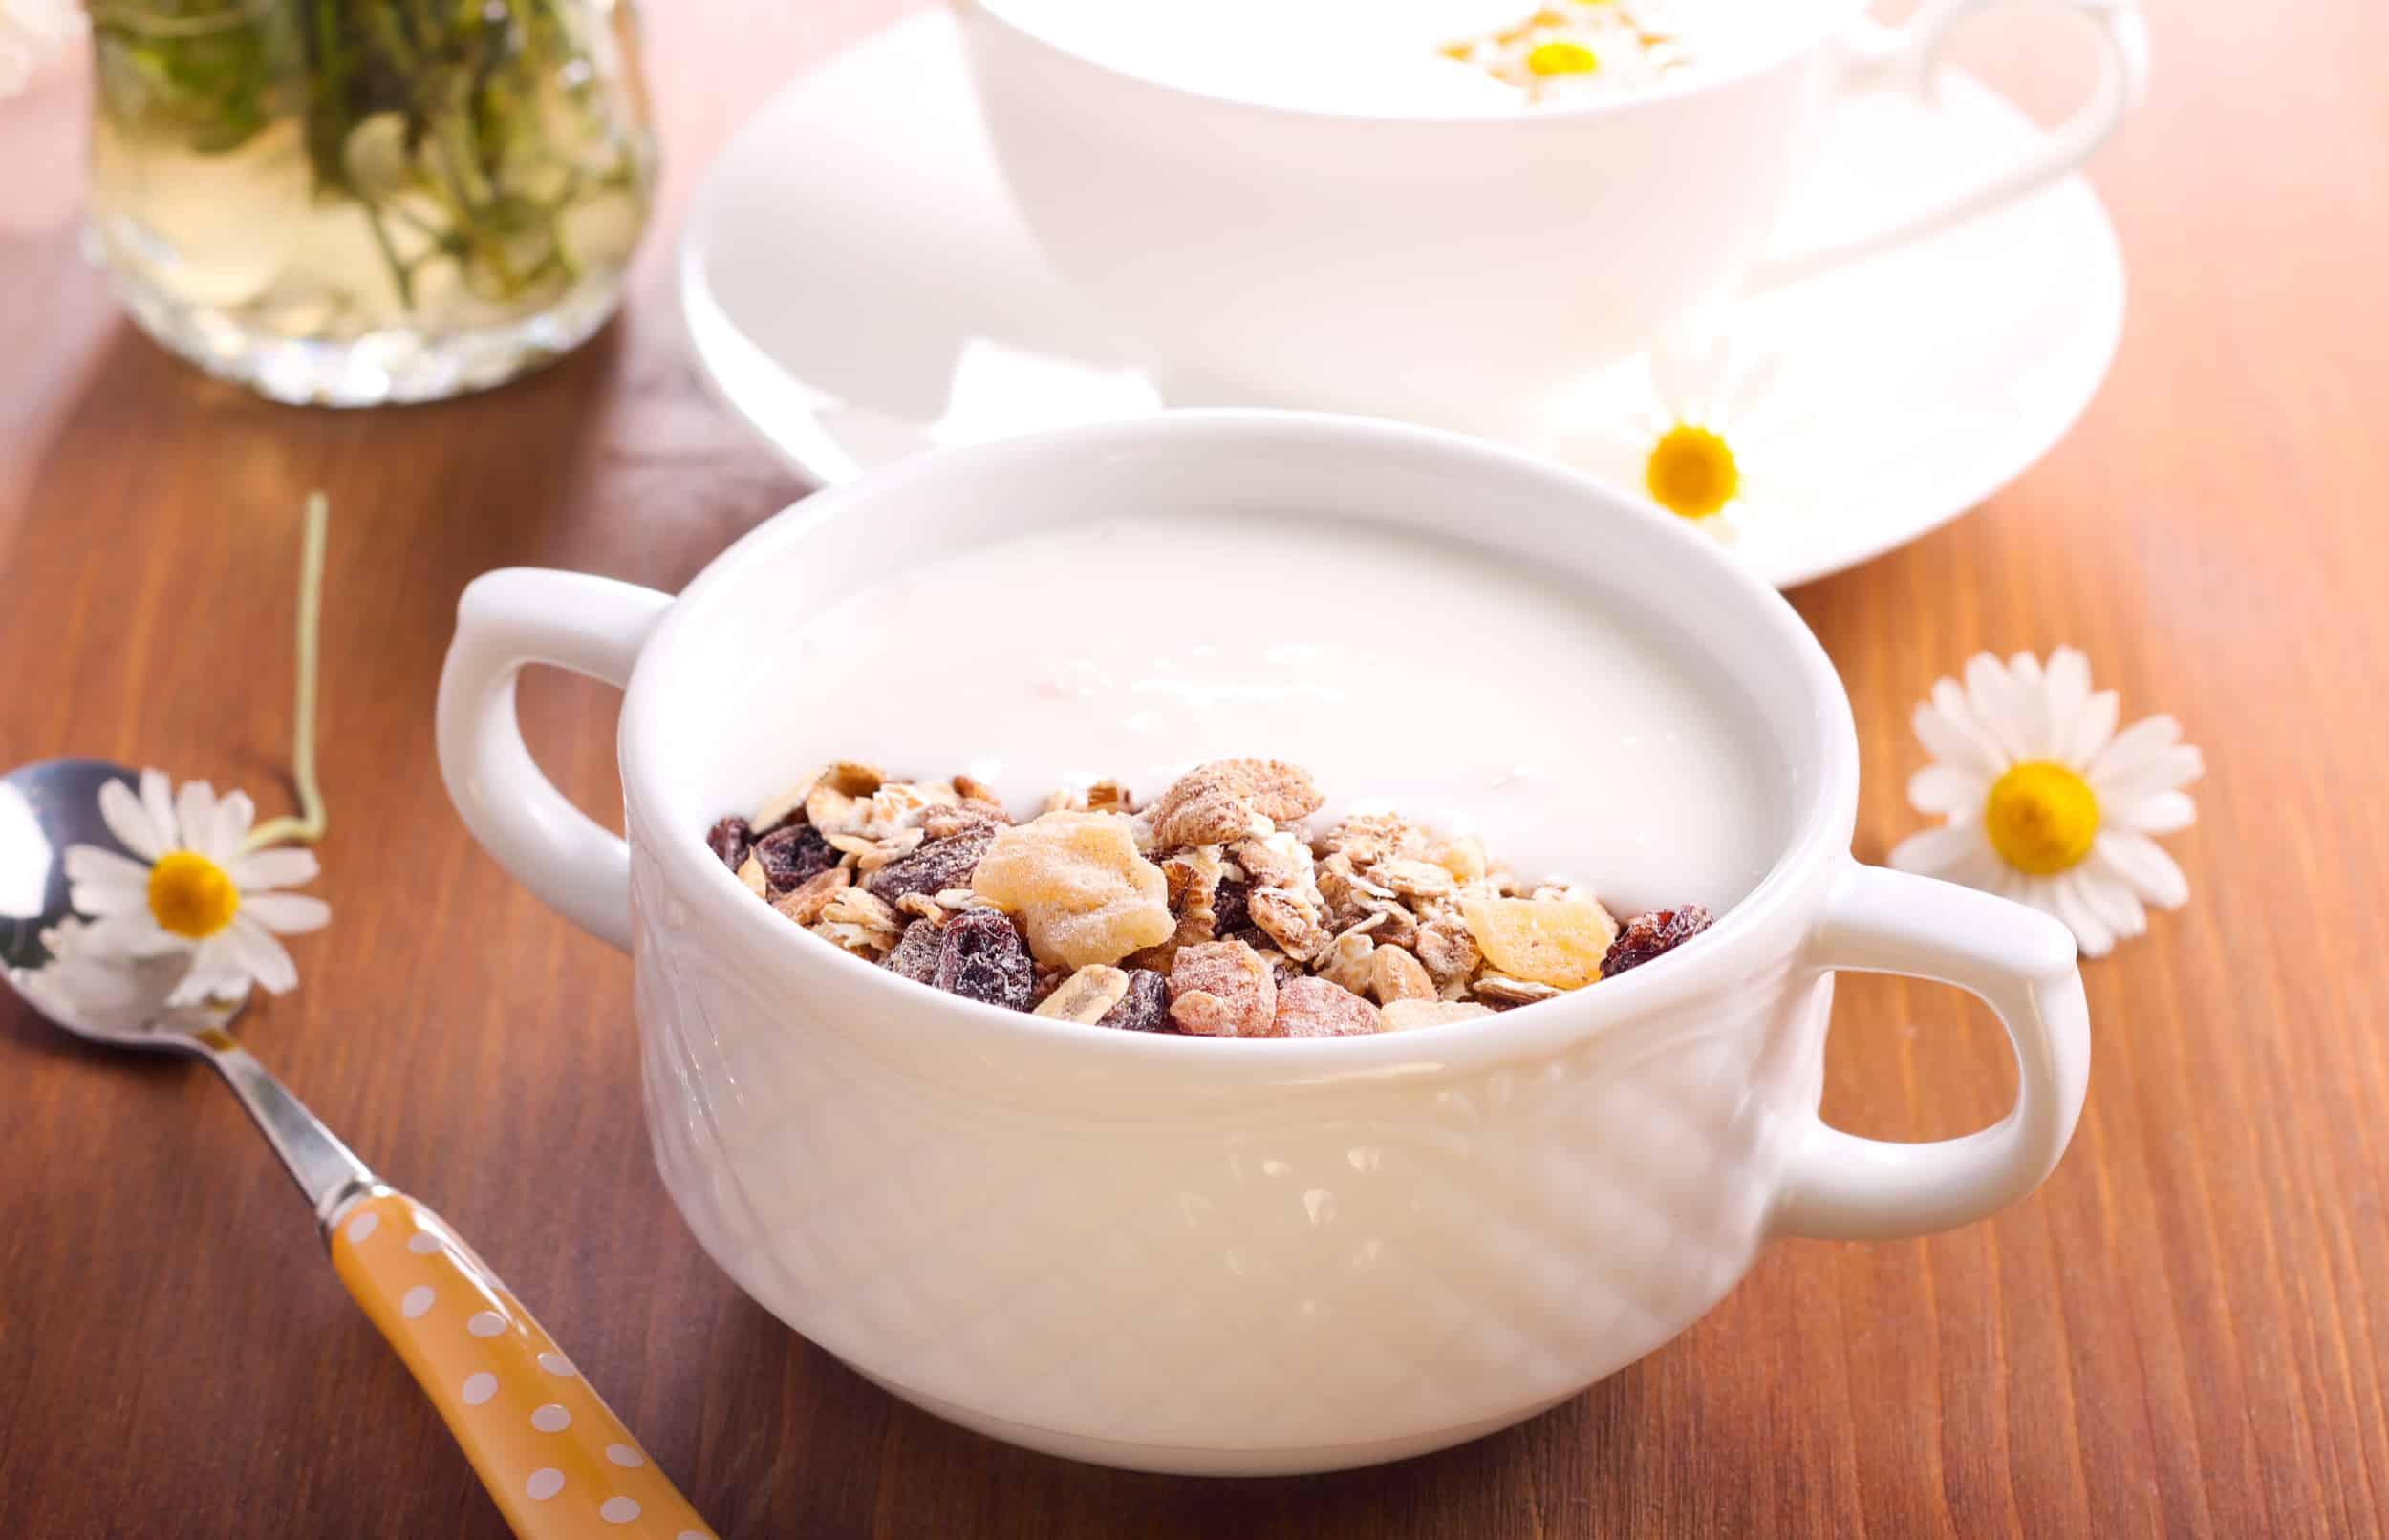 chamomile-milk-tea-6431620